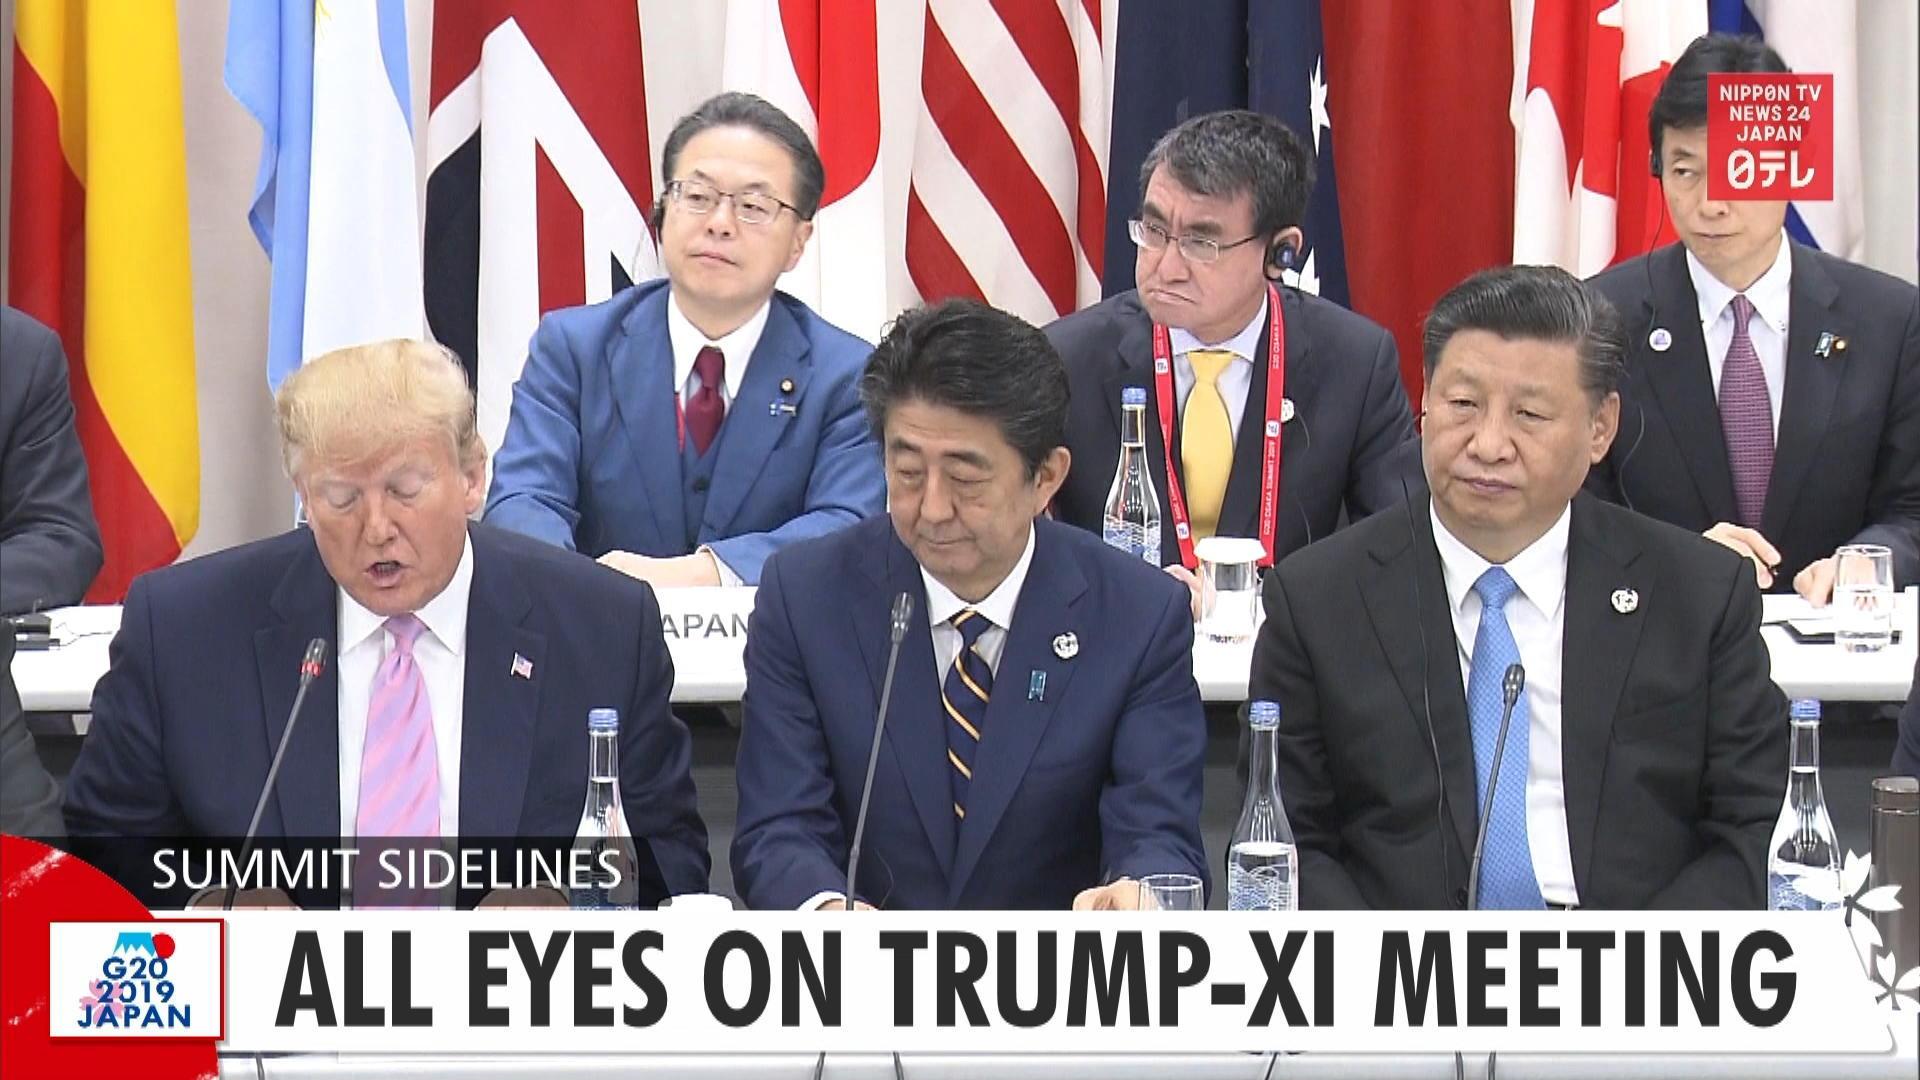 G20: All eyes on Trump-Xi meeting